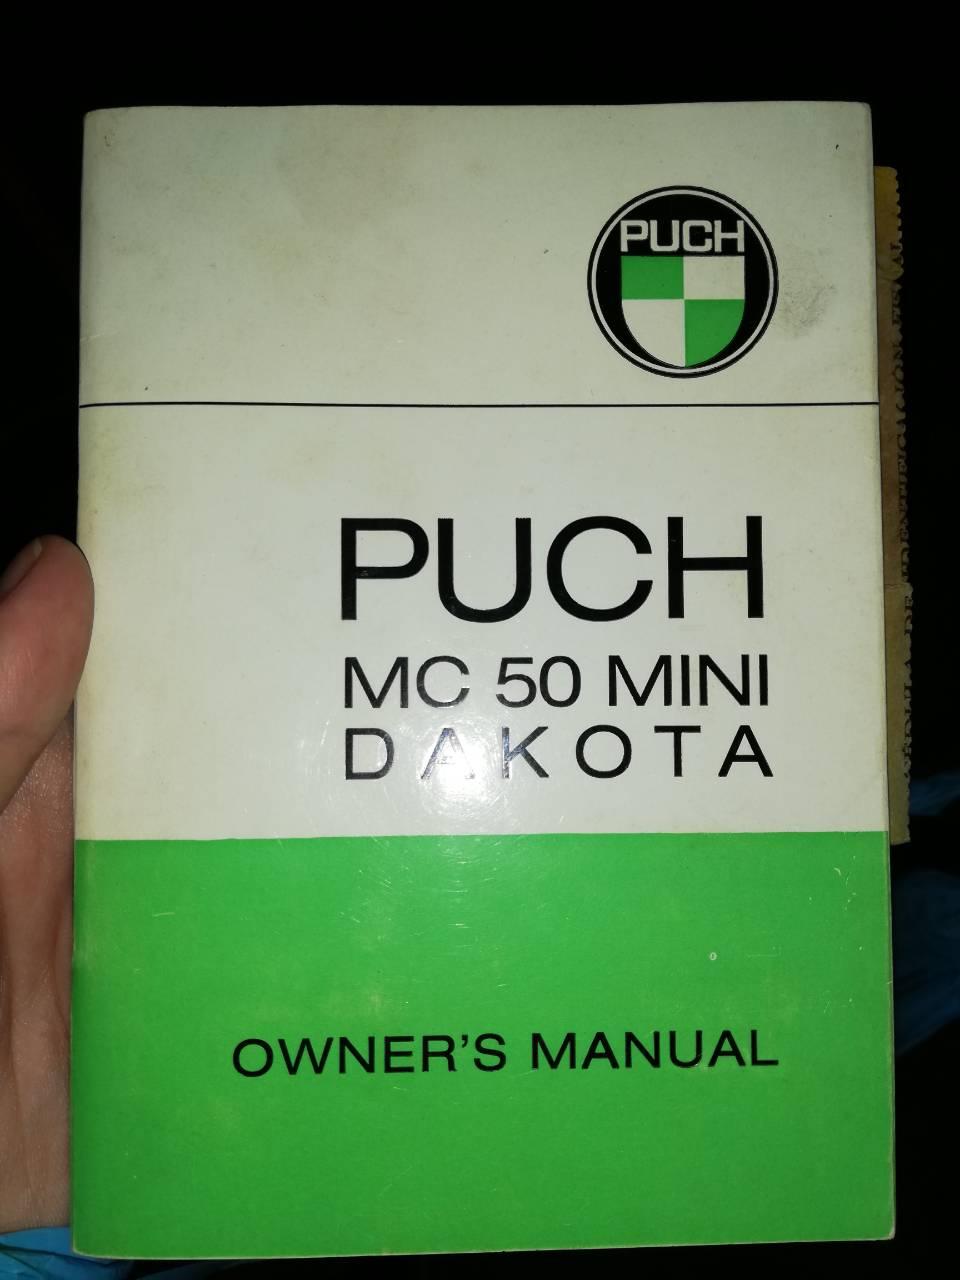 Puch Dakota I - Presentación Img-f710